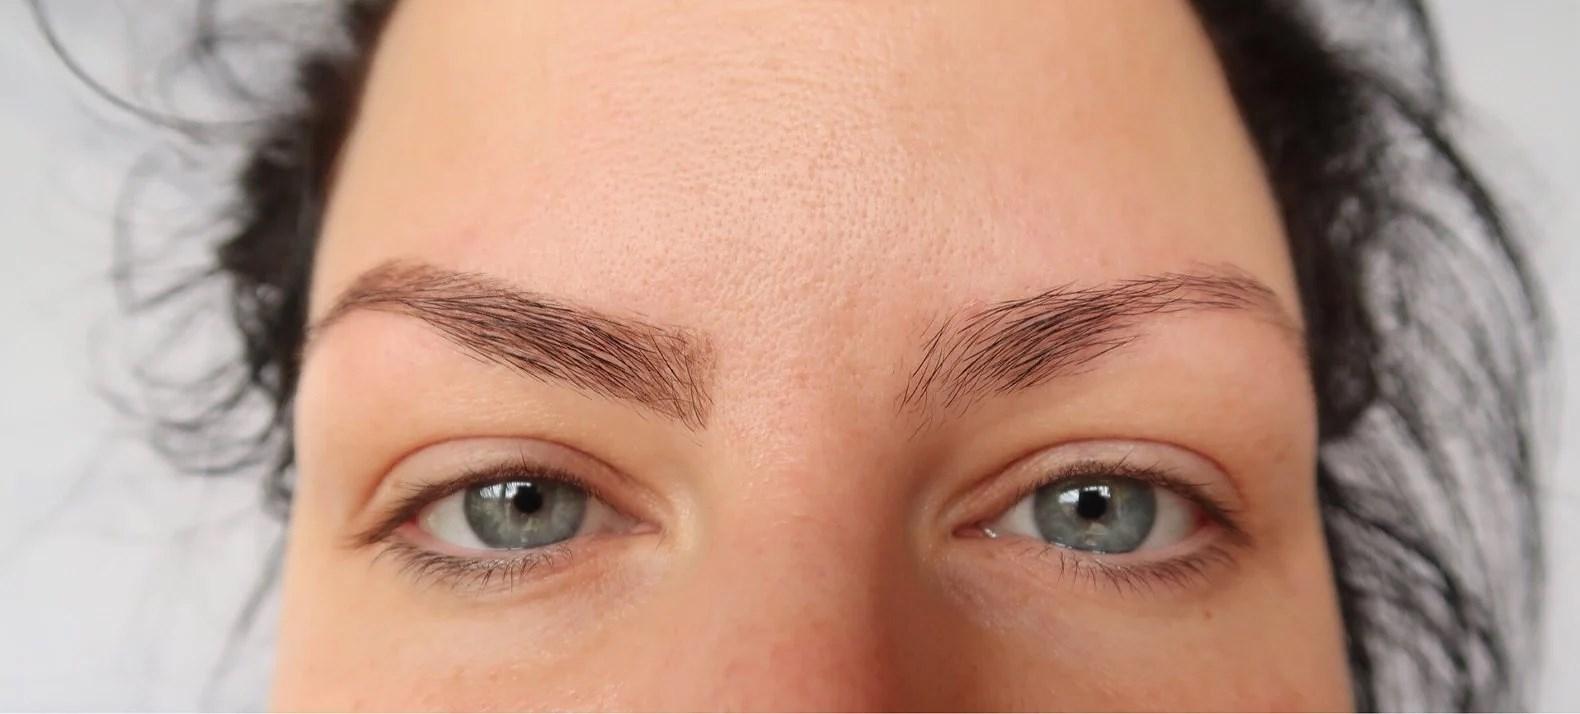 Viva la Diva Eyebrow fine liner recension!